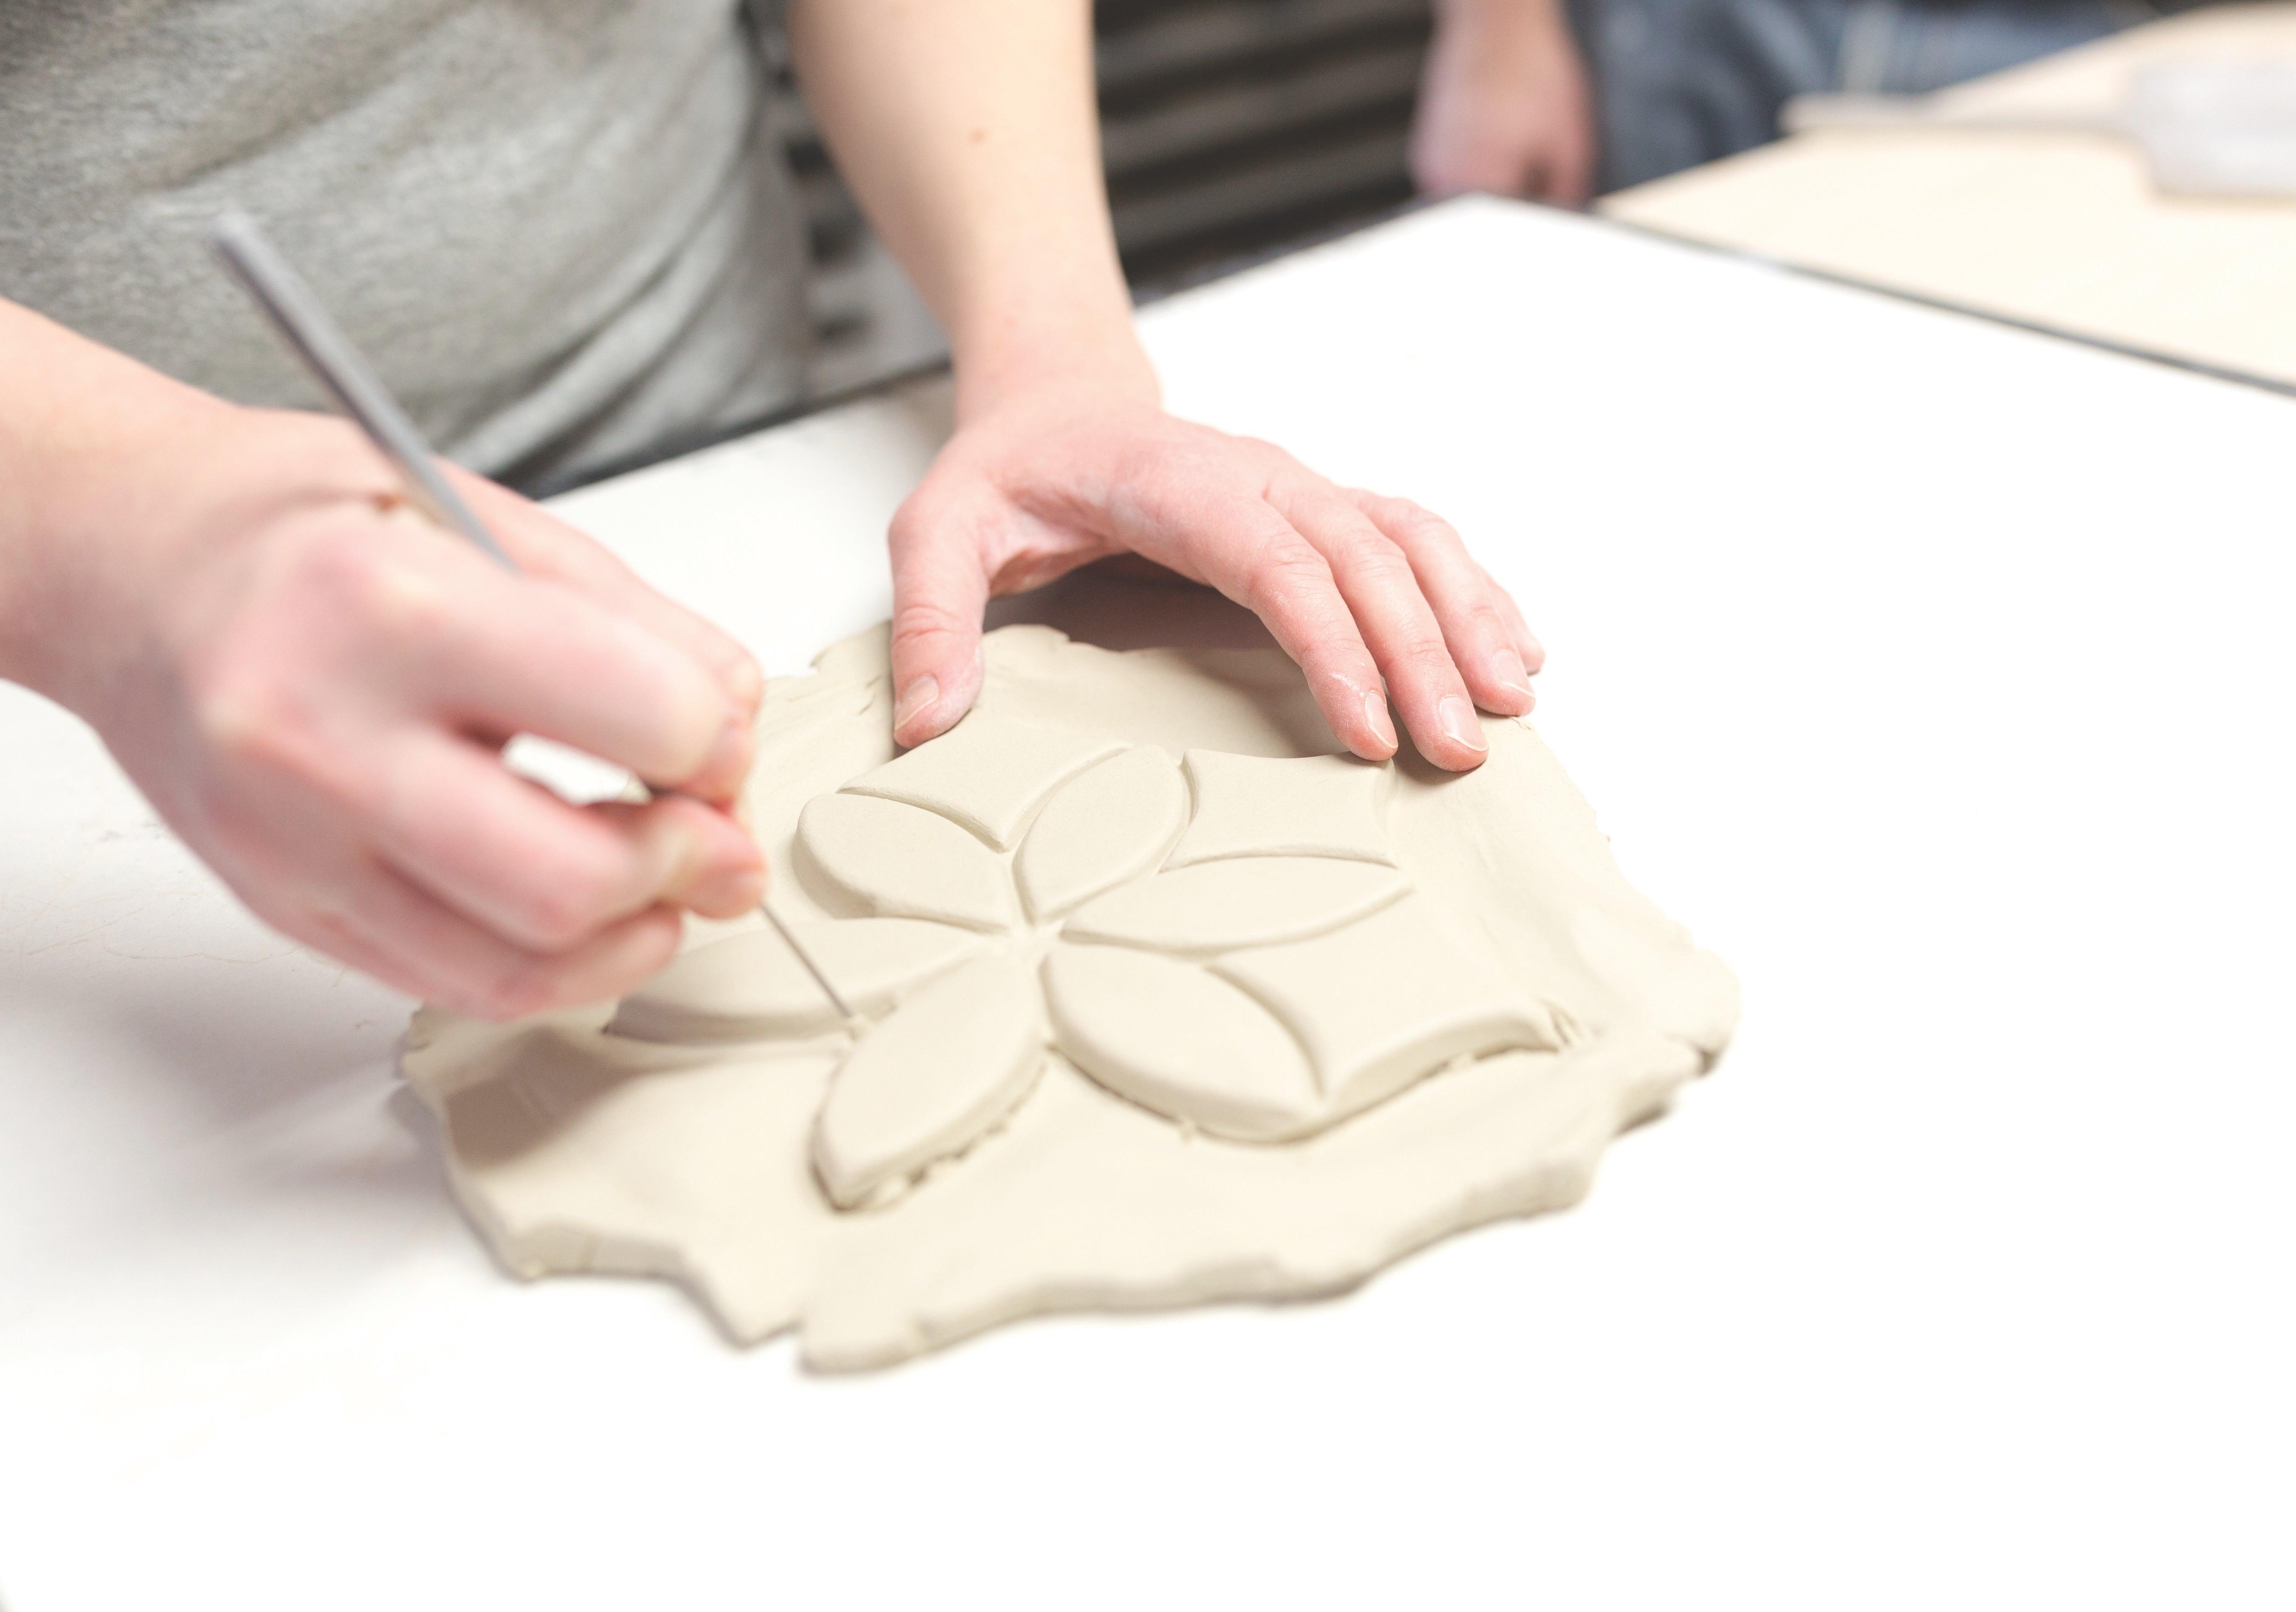 artisan-handcrafting-tile-in-studio.jpg